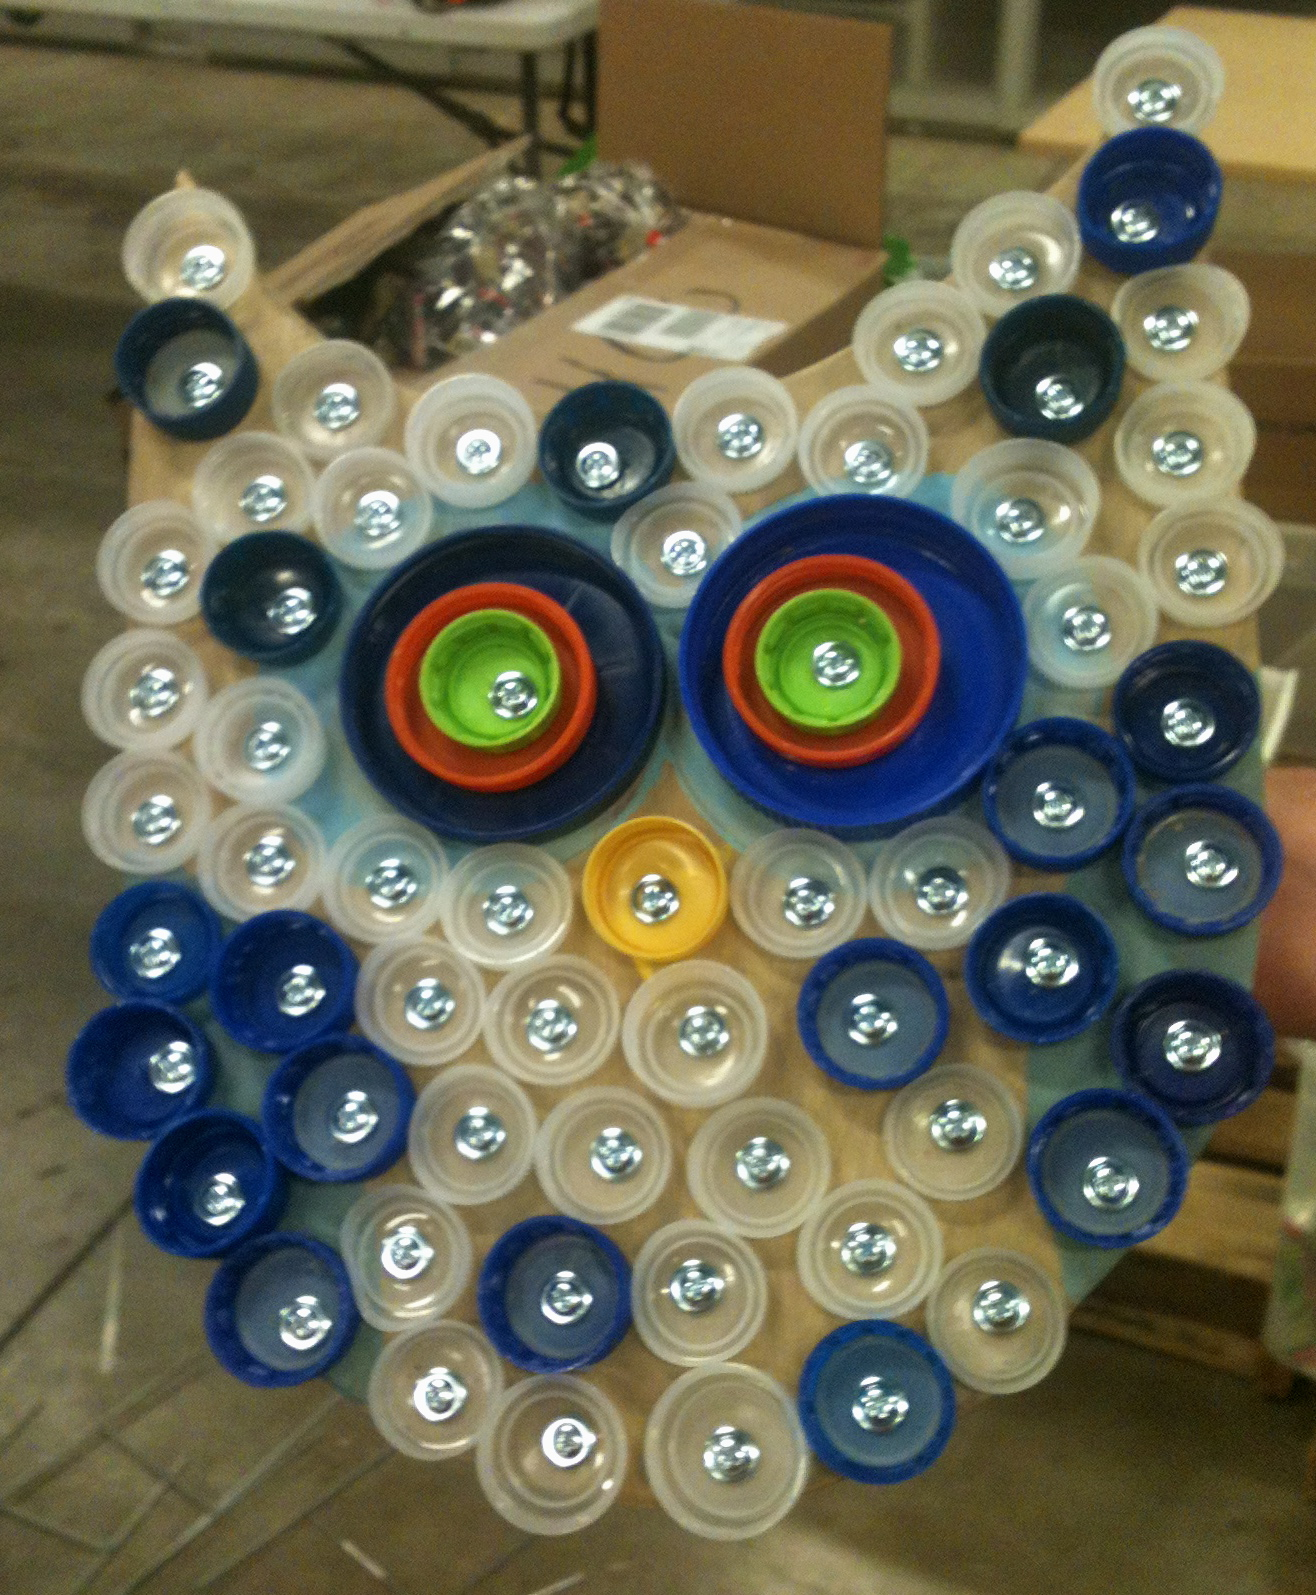 Art design imagination a bottle cap art workshop at a gift for teaching - Plastic bottles recycling ideas boundless imagination ...